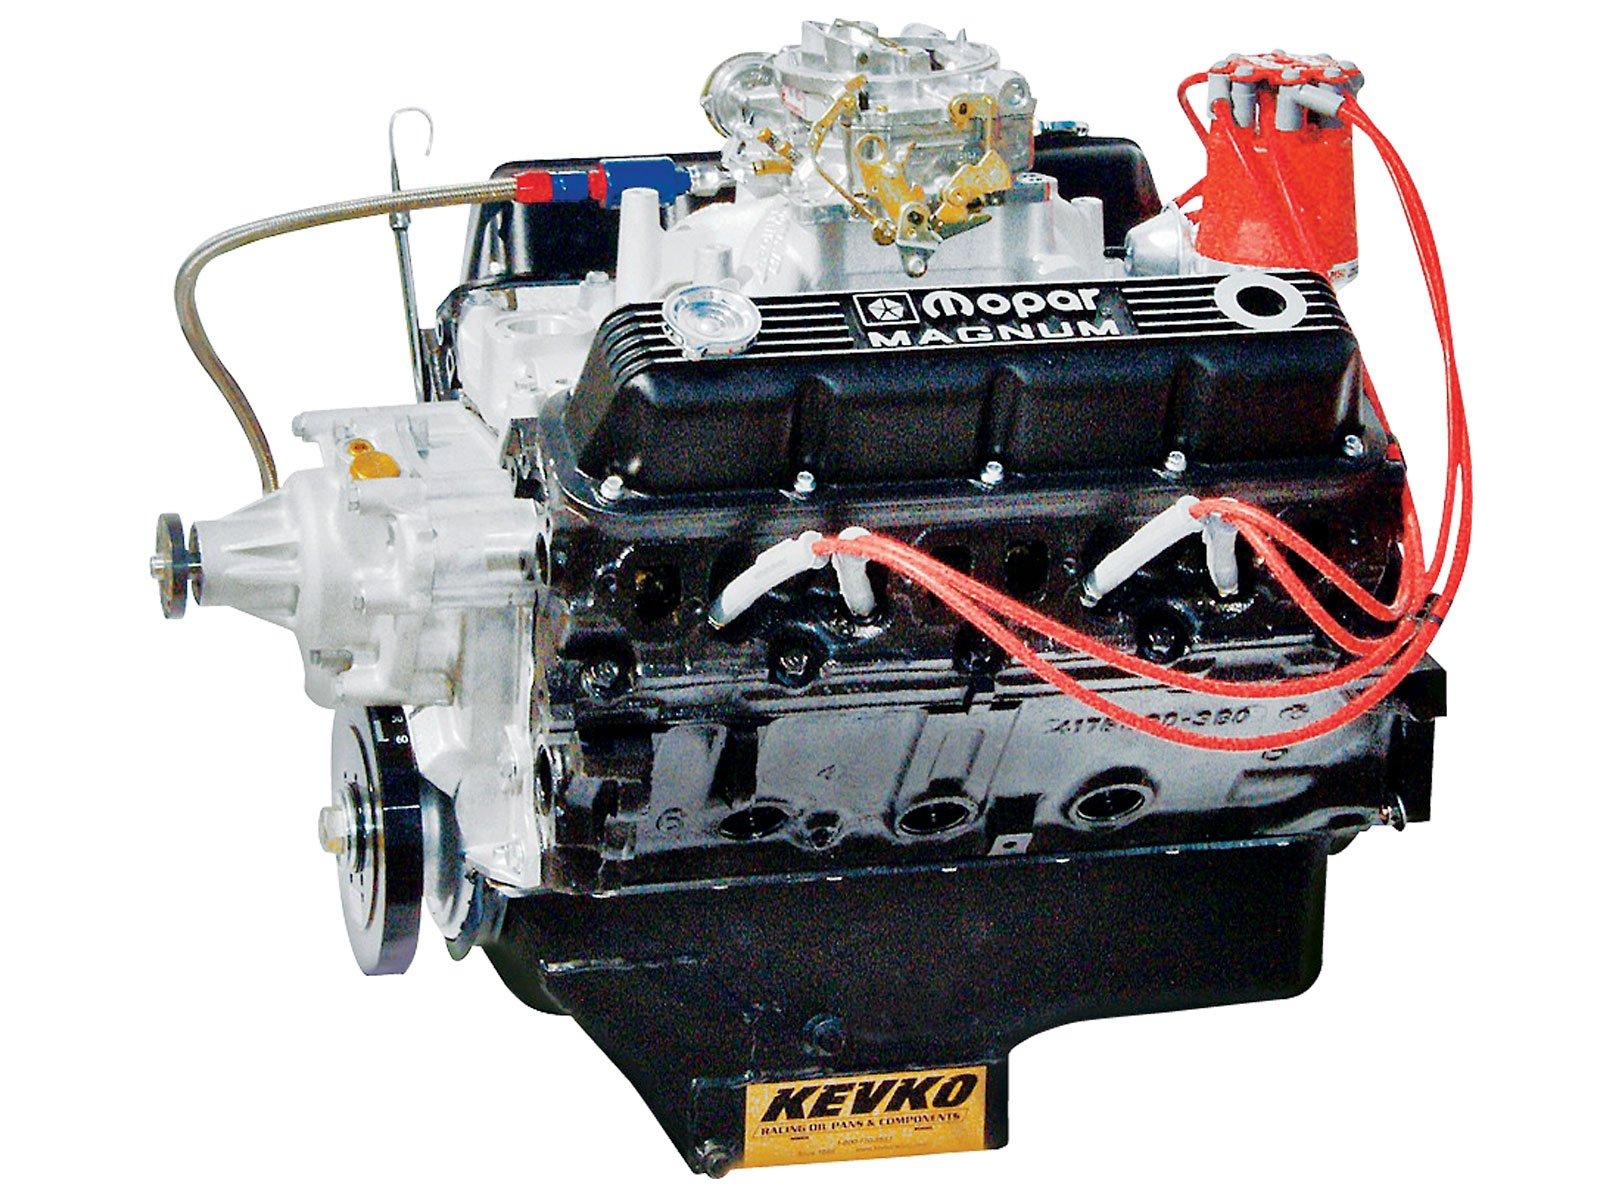 Dodge 360 Magnum Engine Air Dodge Free Engine Image For